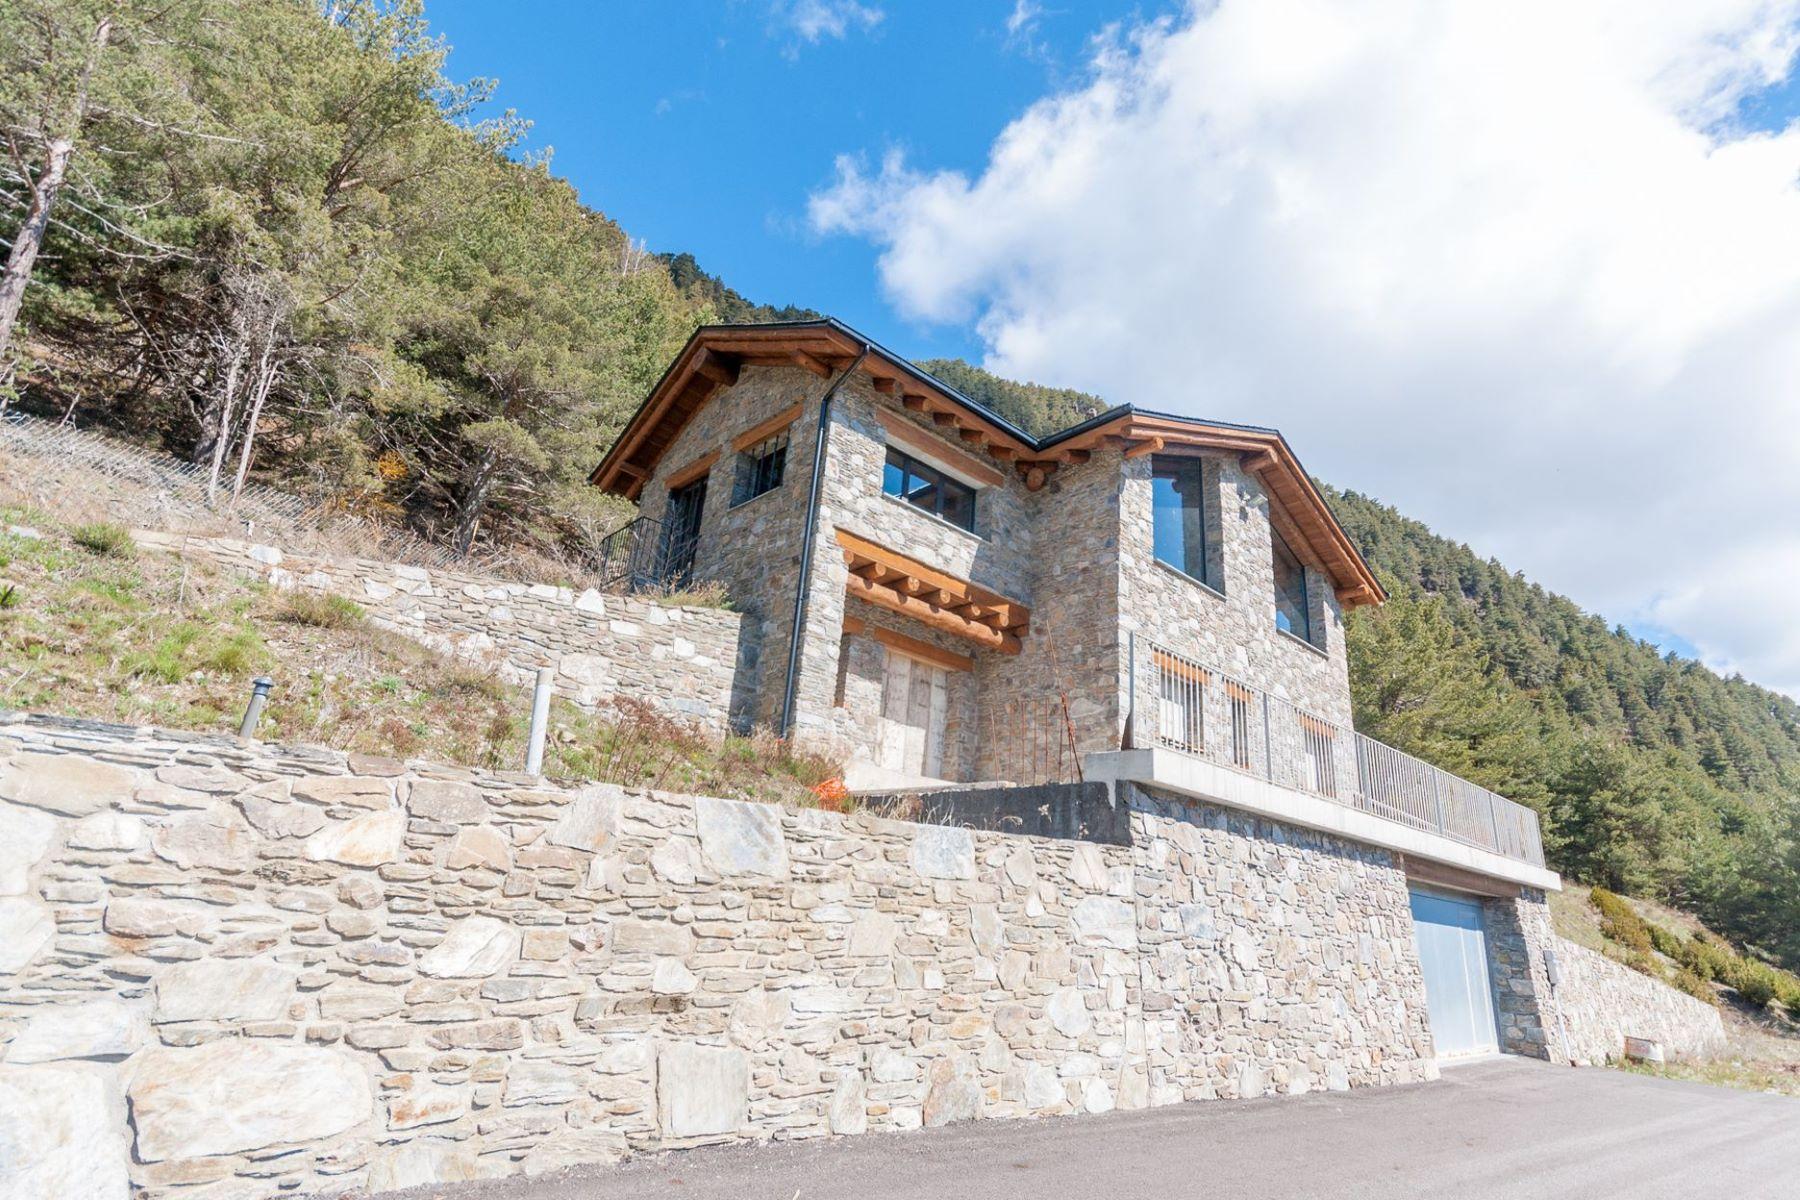 Villa per Vendita alle ore Countryside house for sale in Vila Vila, Encamp, AD200 Andorra